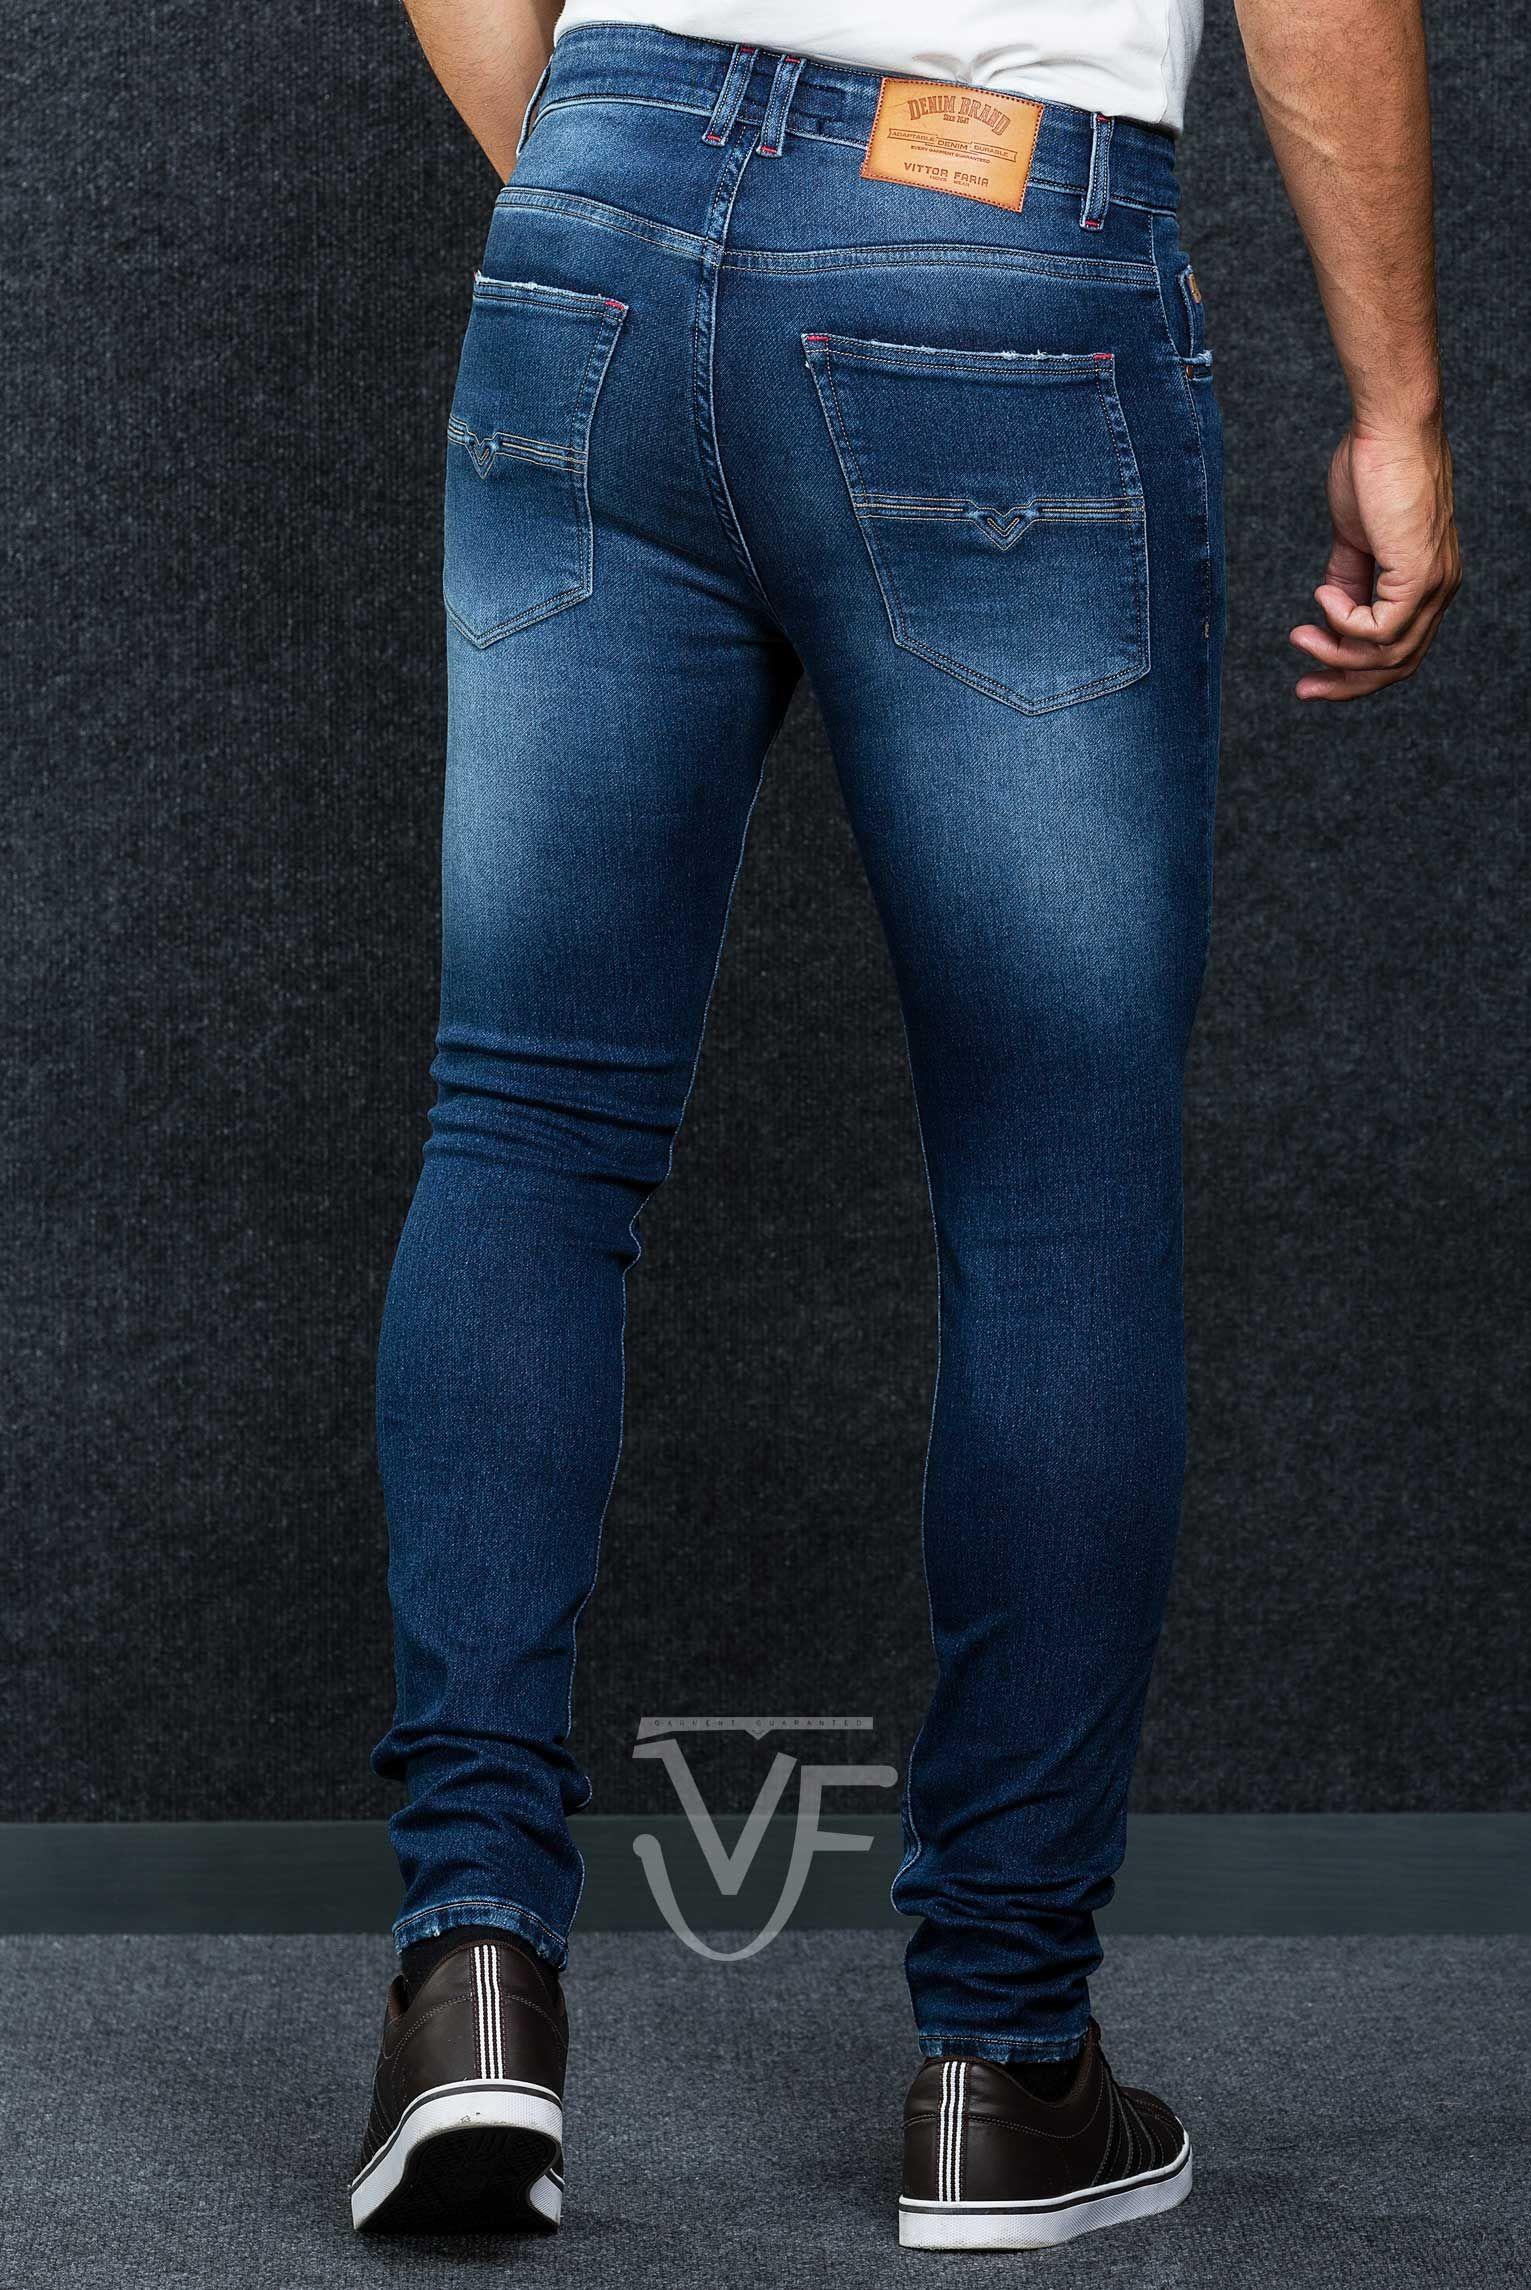 Jeans Skinny Basic VF original Denim ULTRA STRETCH  Fit: Jeans deve ser vestido justo  Pormenor: Bordado 3D  Perna: Justa Cor: Sky blue Marca: VF - VITTOR FARIA